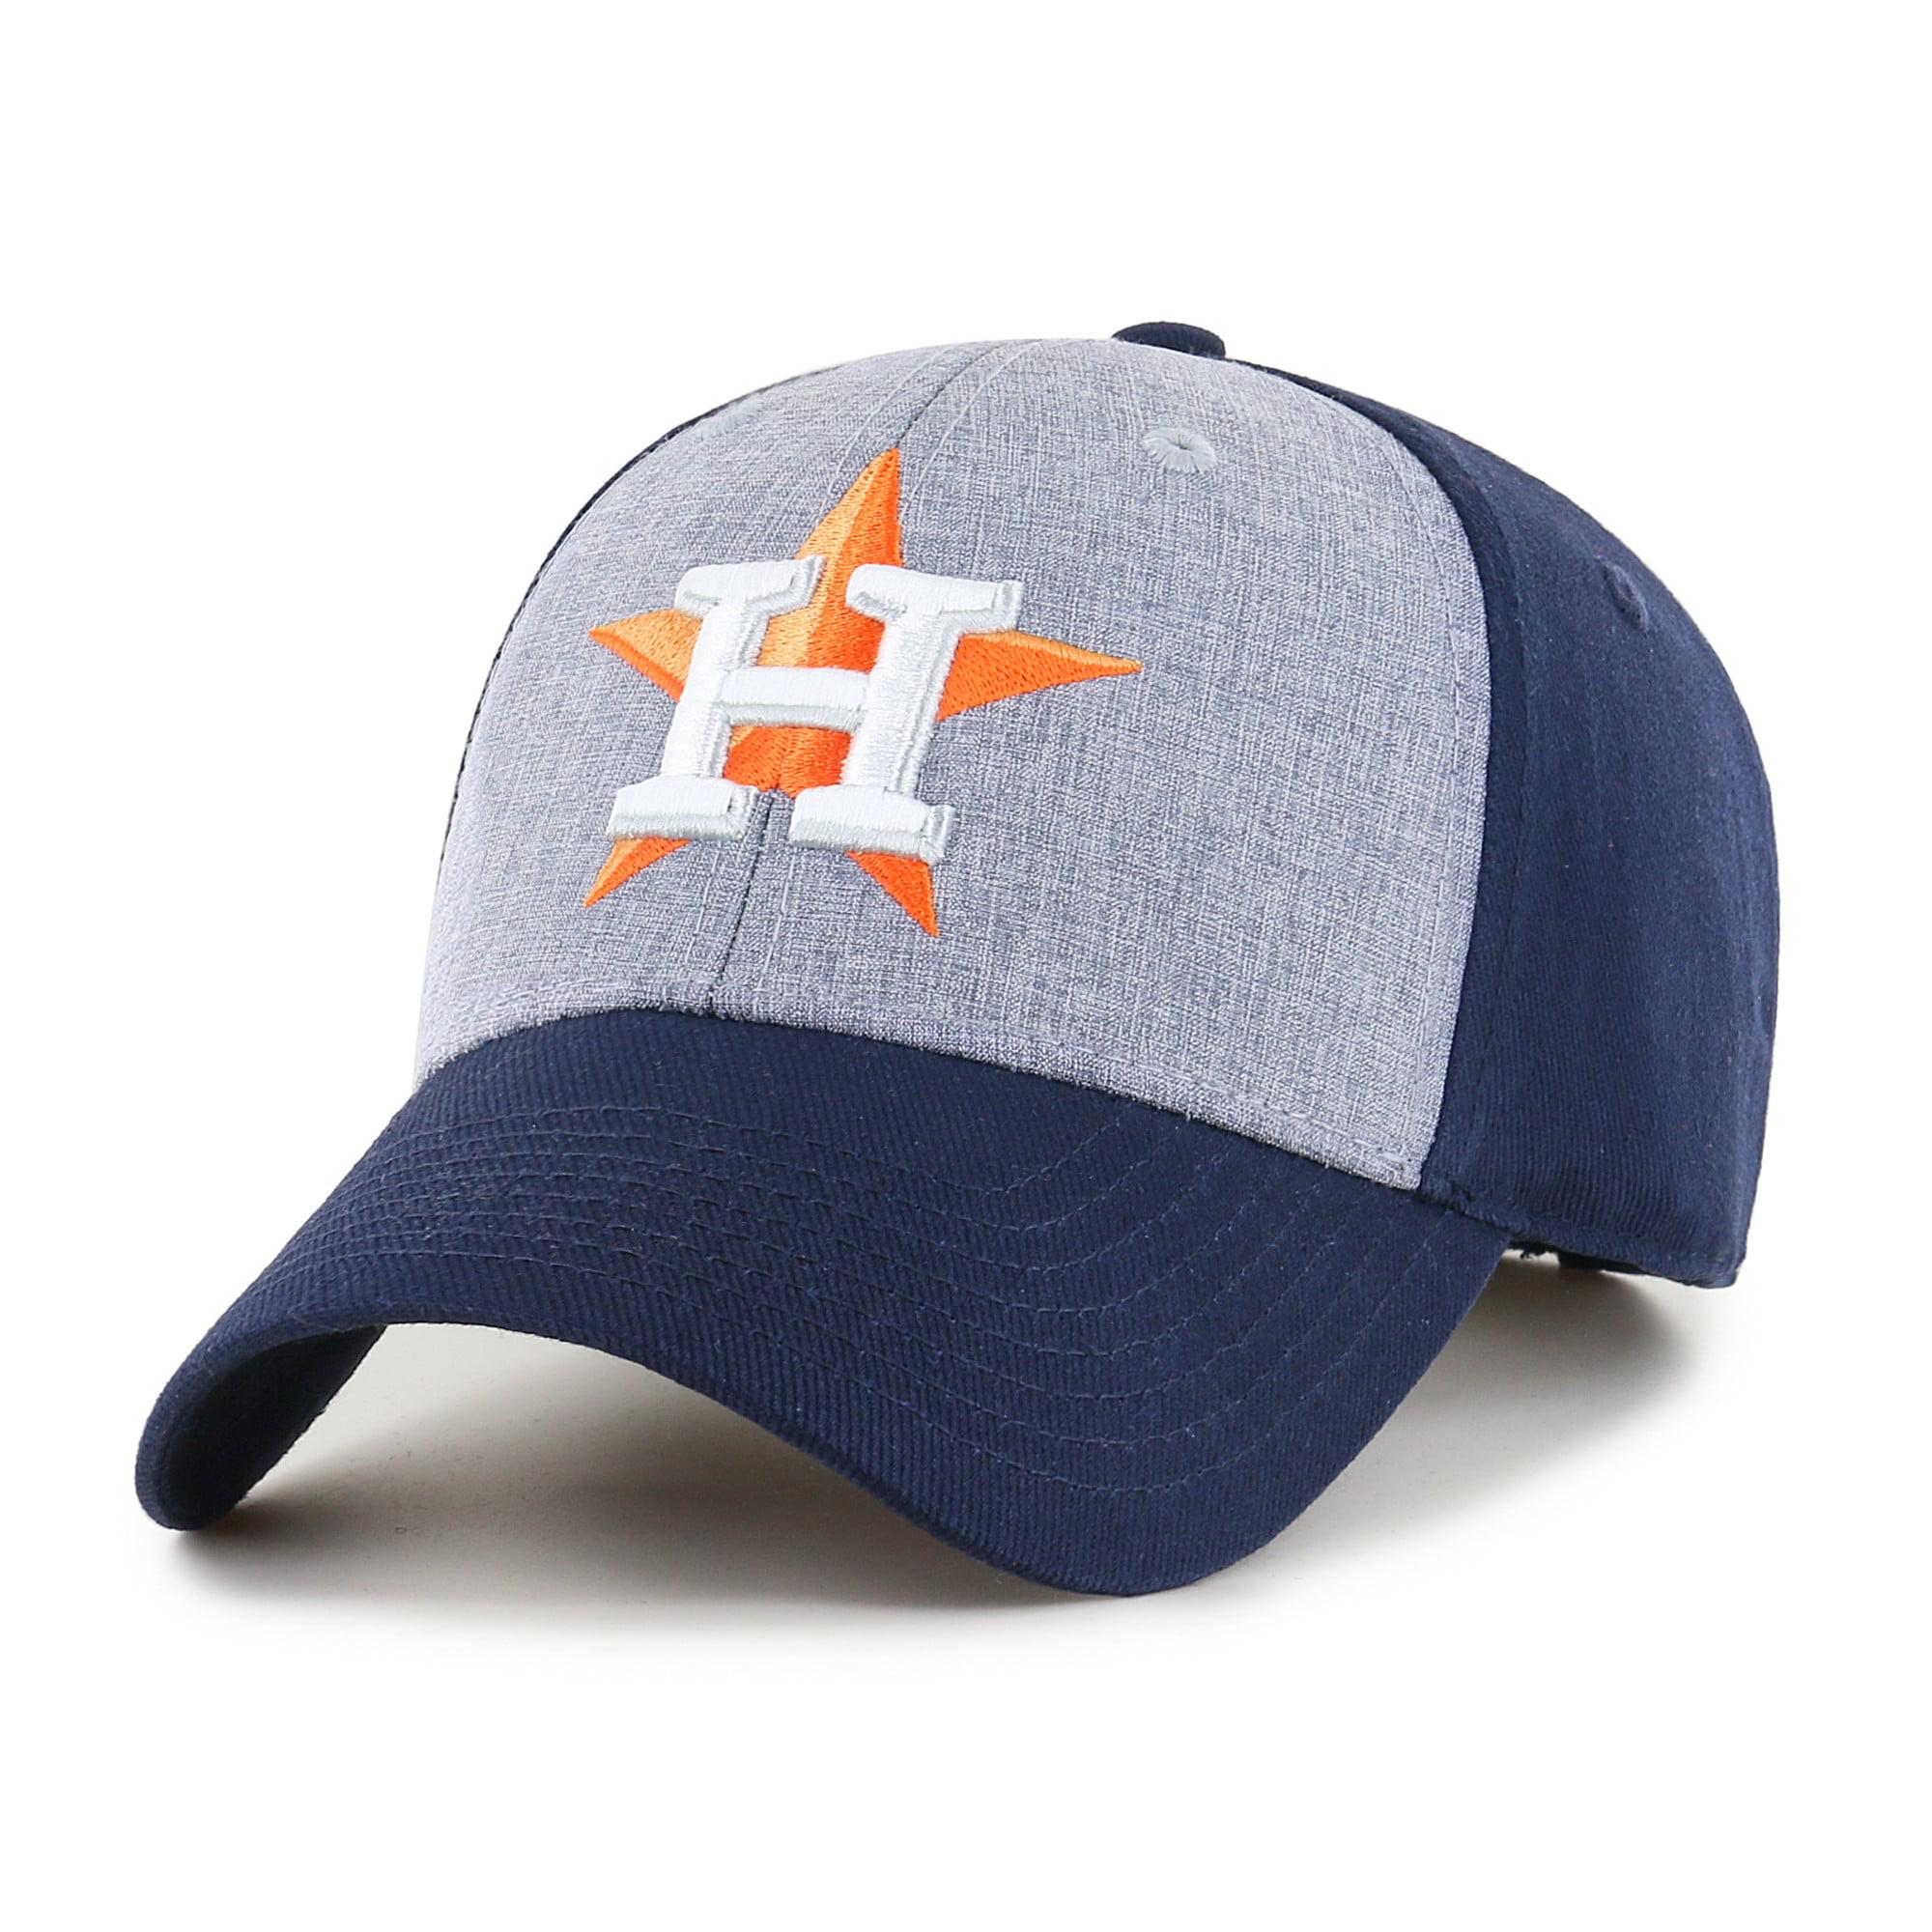 Fan Favorite MLB Essential Adjustable Hat, Houston Astros